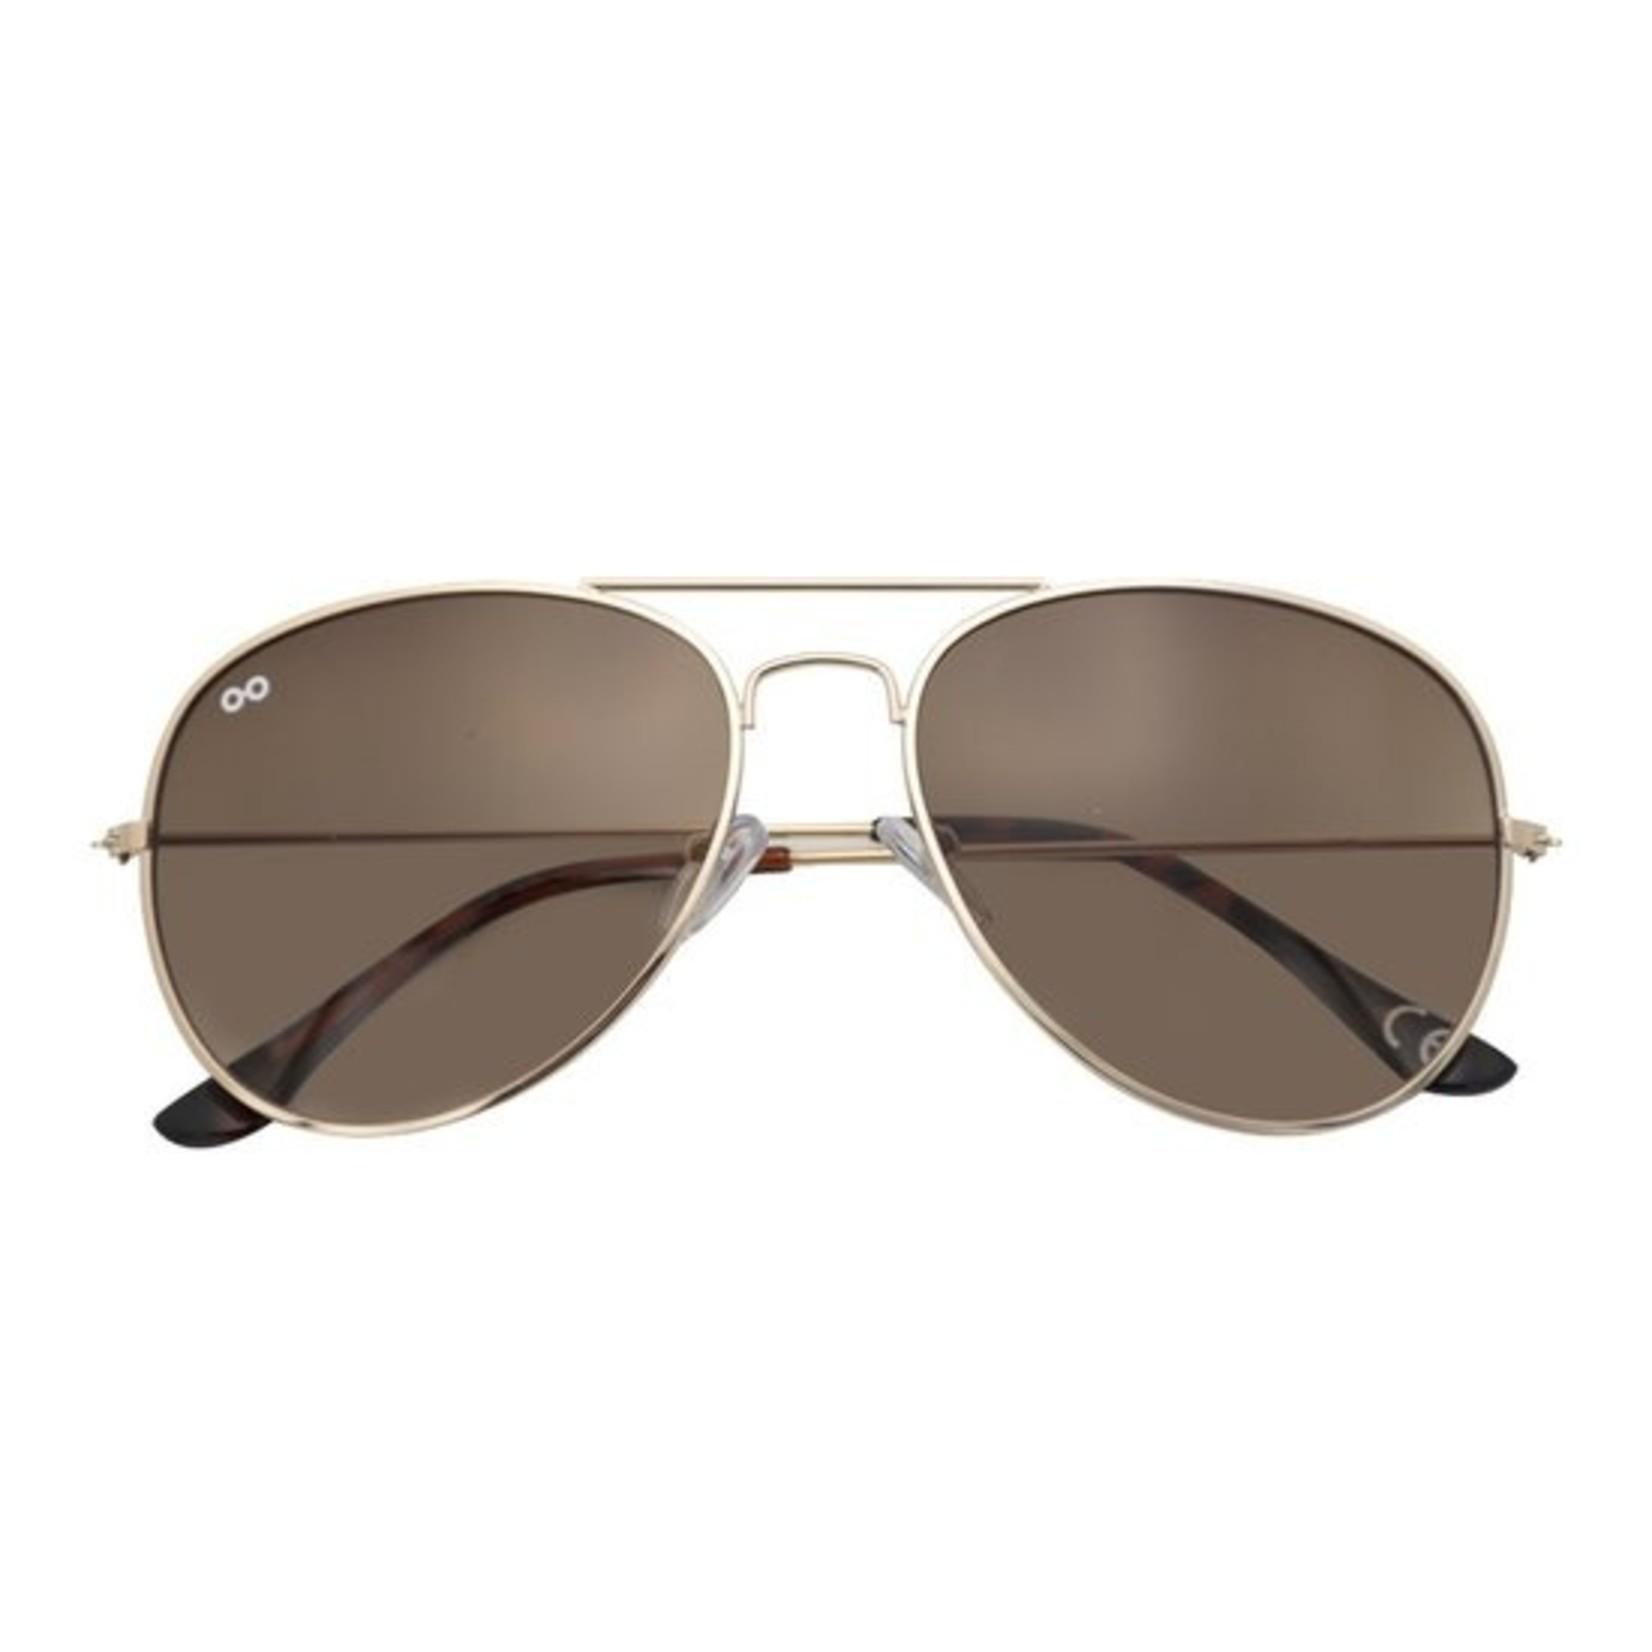 Croon Scott Shiny Gold/Brown zonnebril pilotenbril